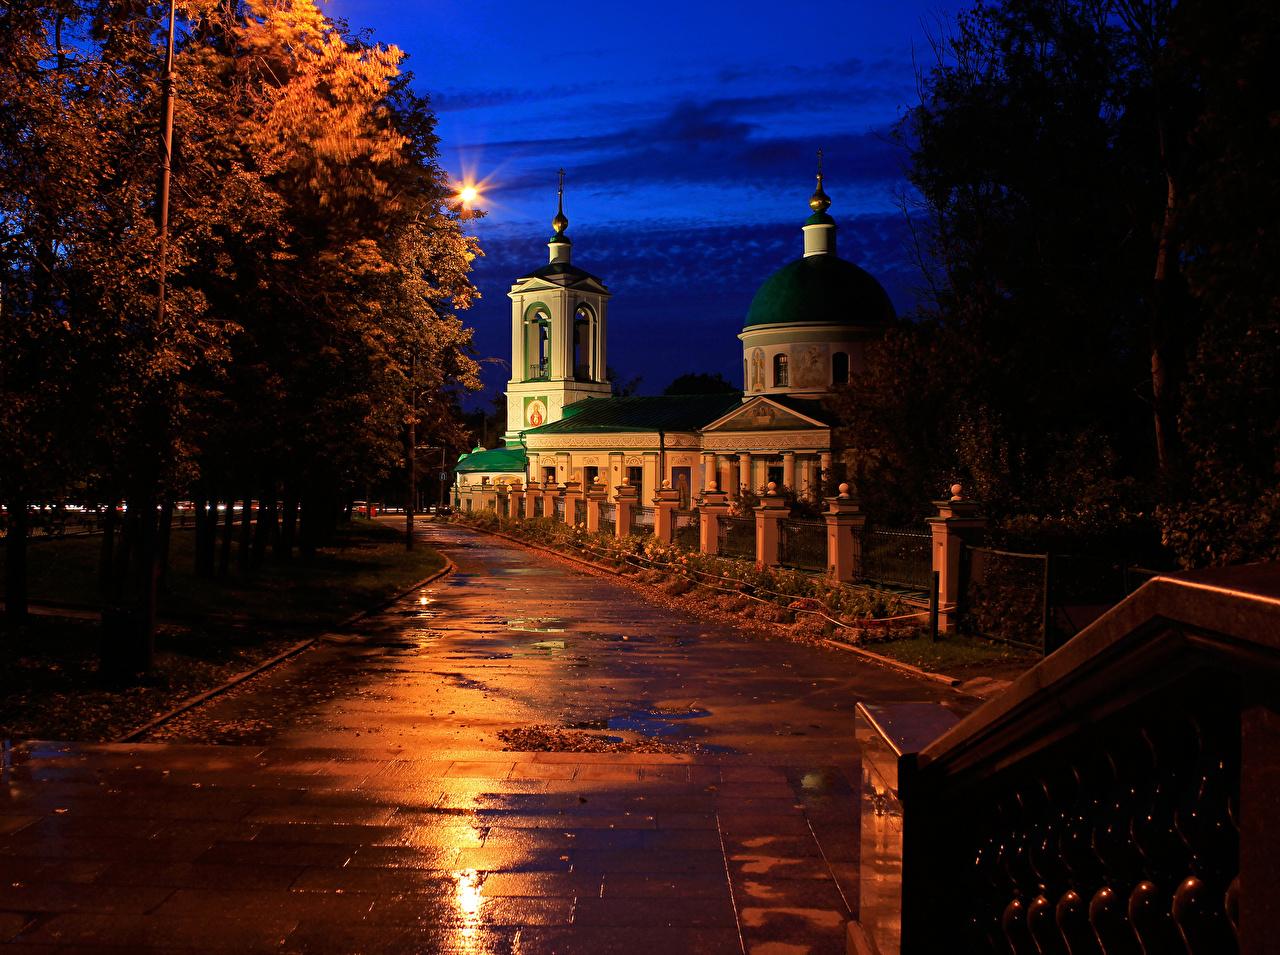 Фото Москва Церковь Россия Holy Trinity Church on Vorobyovy Gory Ночь Храмы Города Ночные